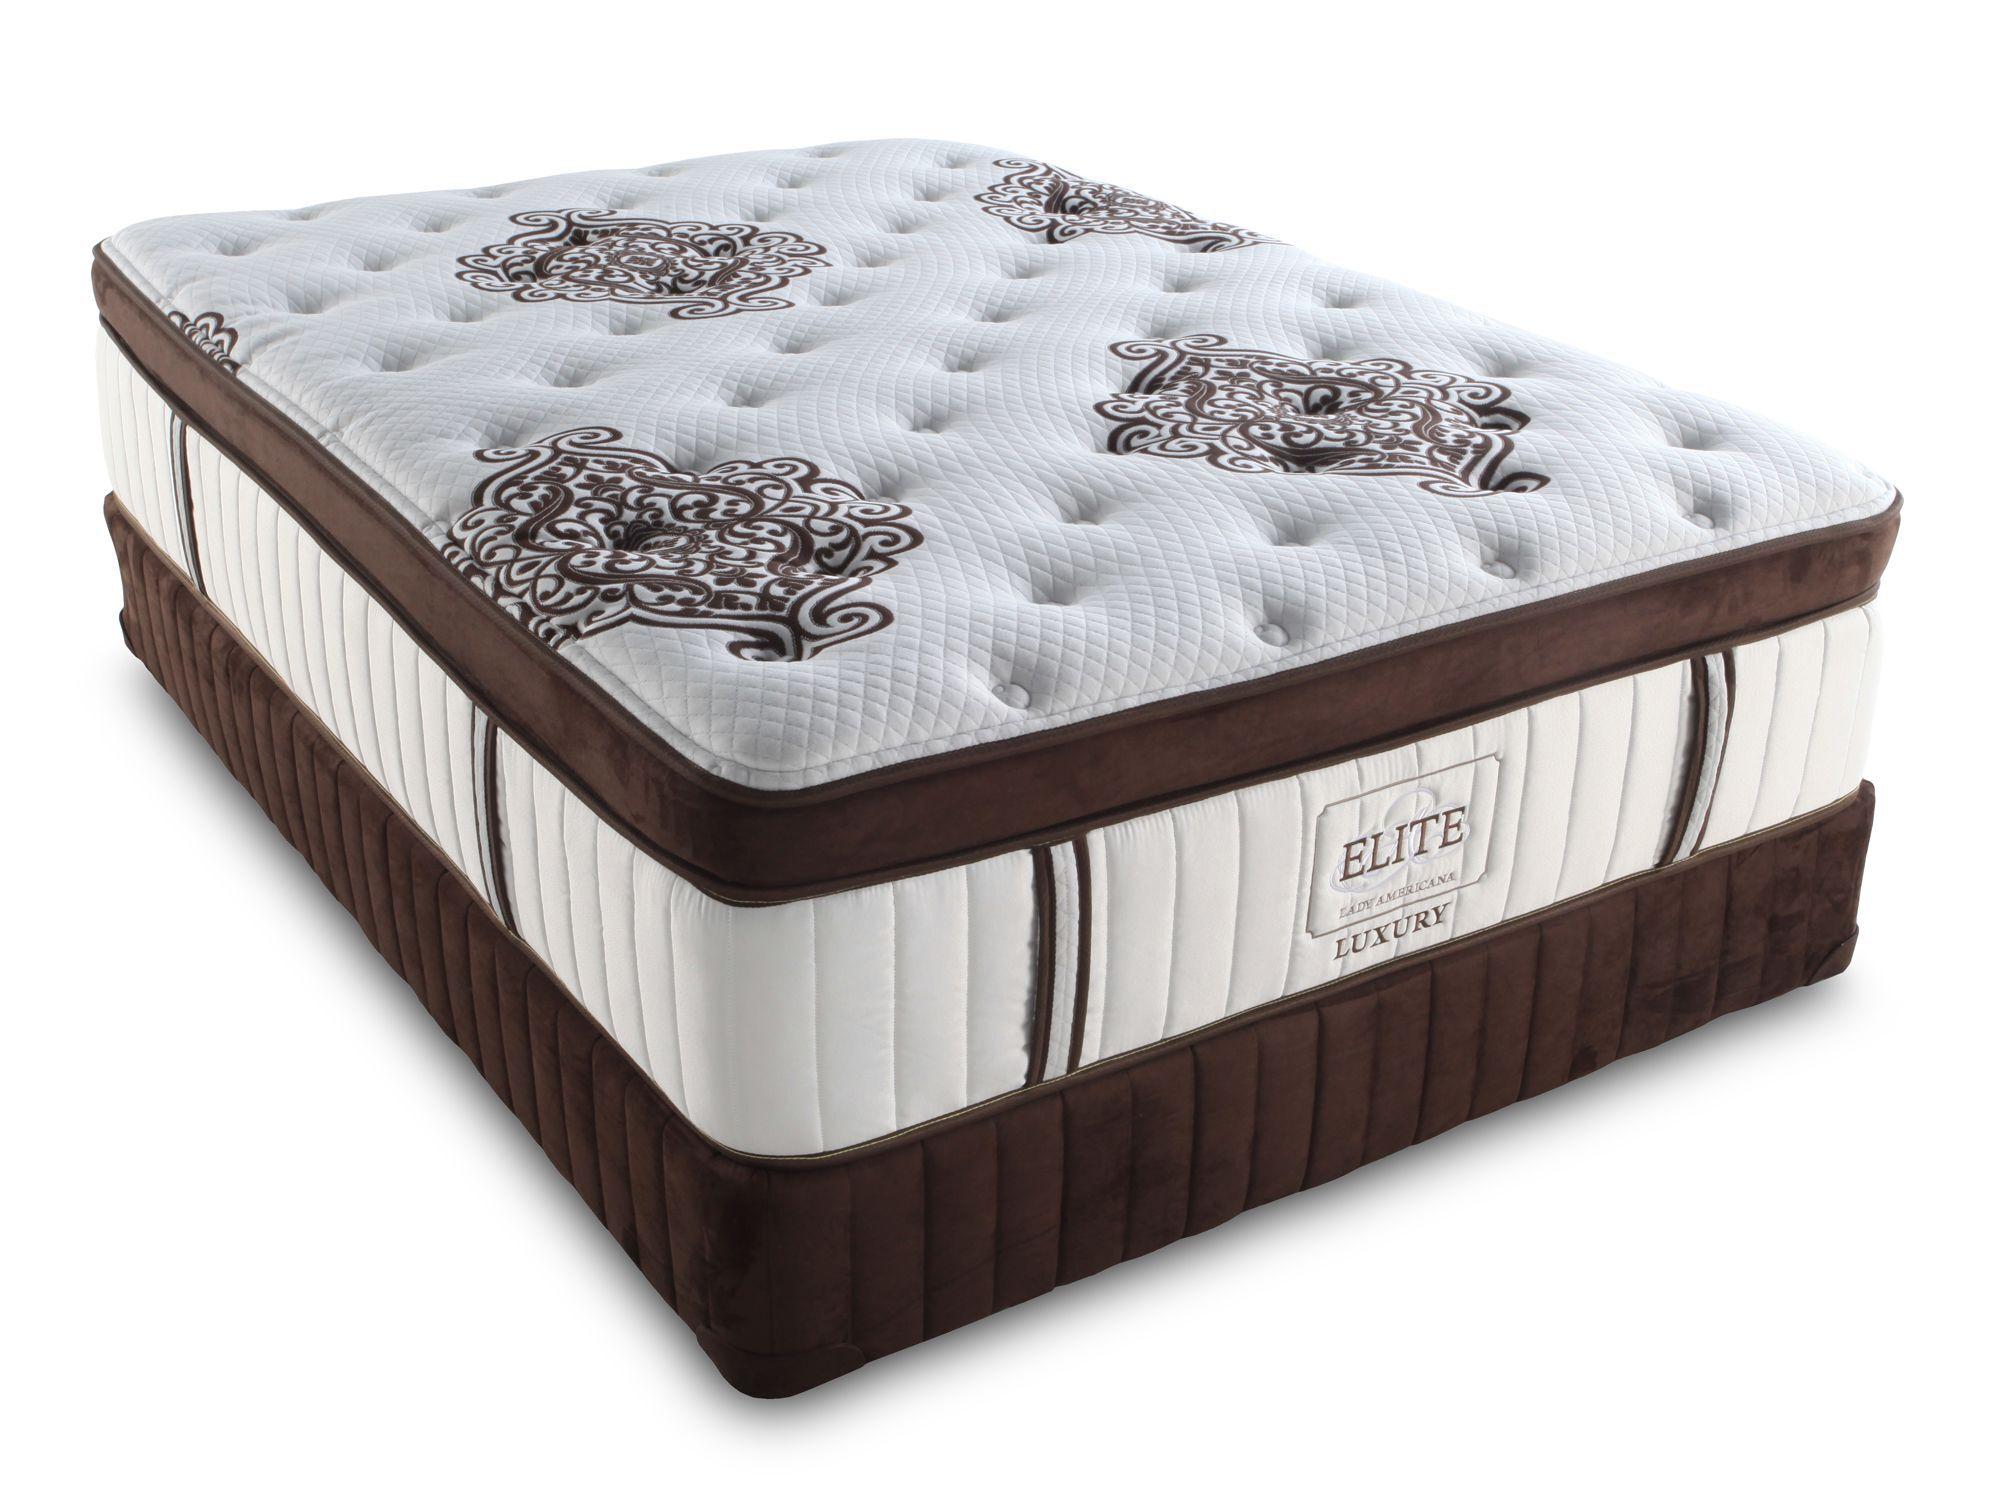 sofas tulsa ok ikea sectional sofa with chaise lady americana elite luxury resplendent mattress   mathis ...